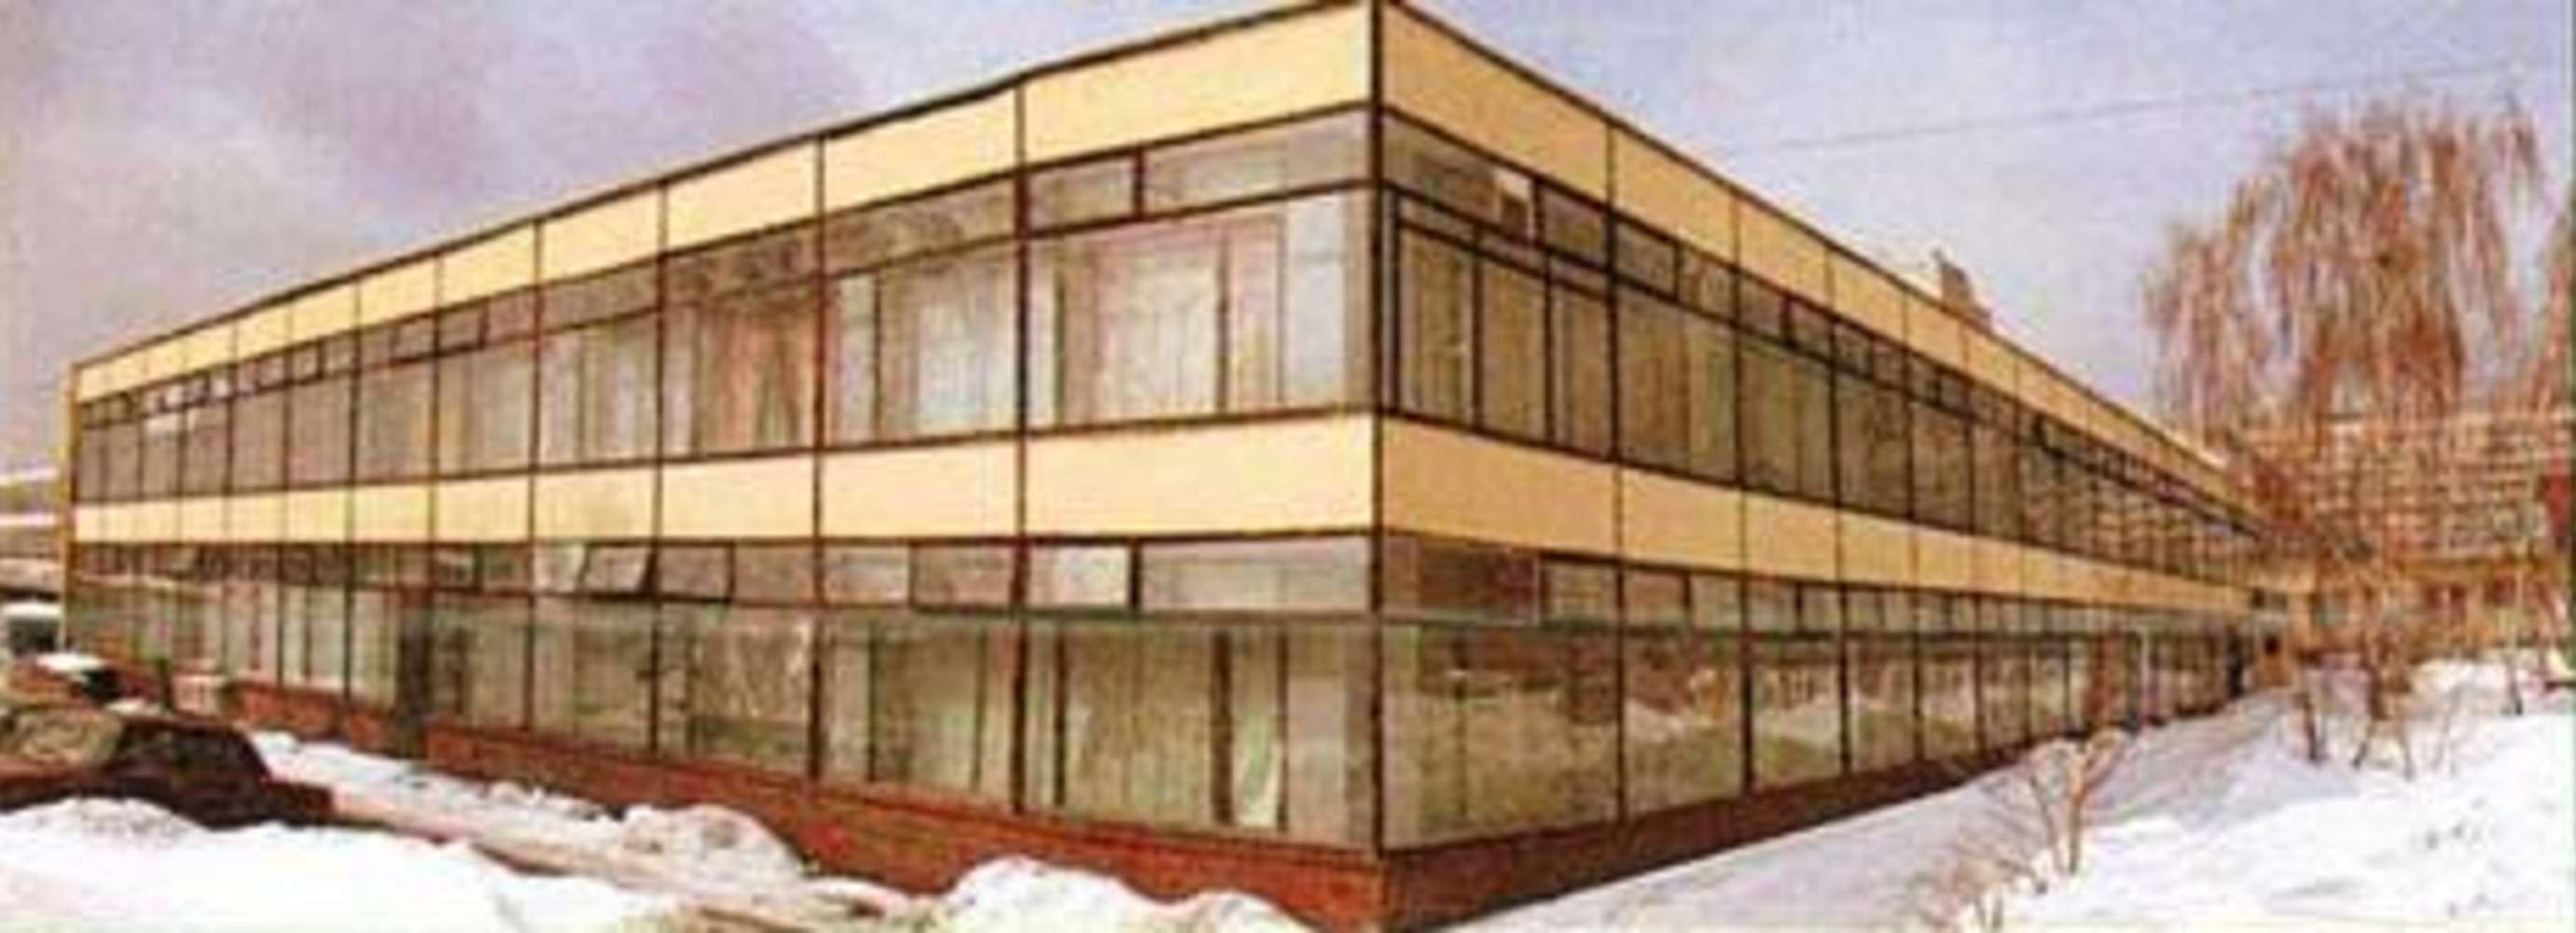 Офисная недвижимость Москва,  - Намёткина ул. 10А стр.1